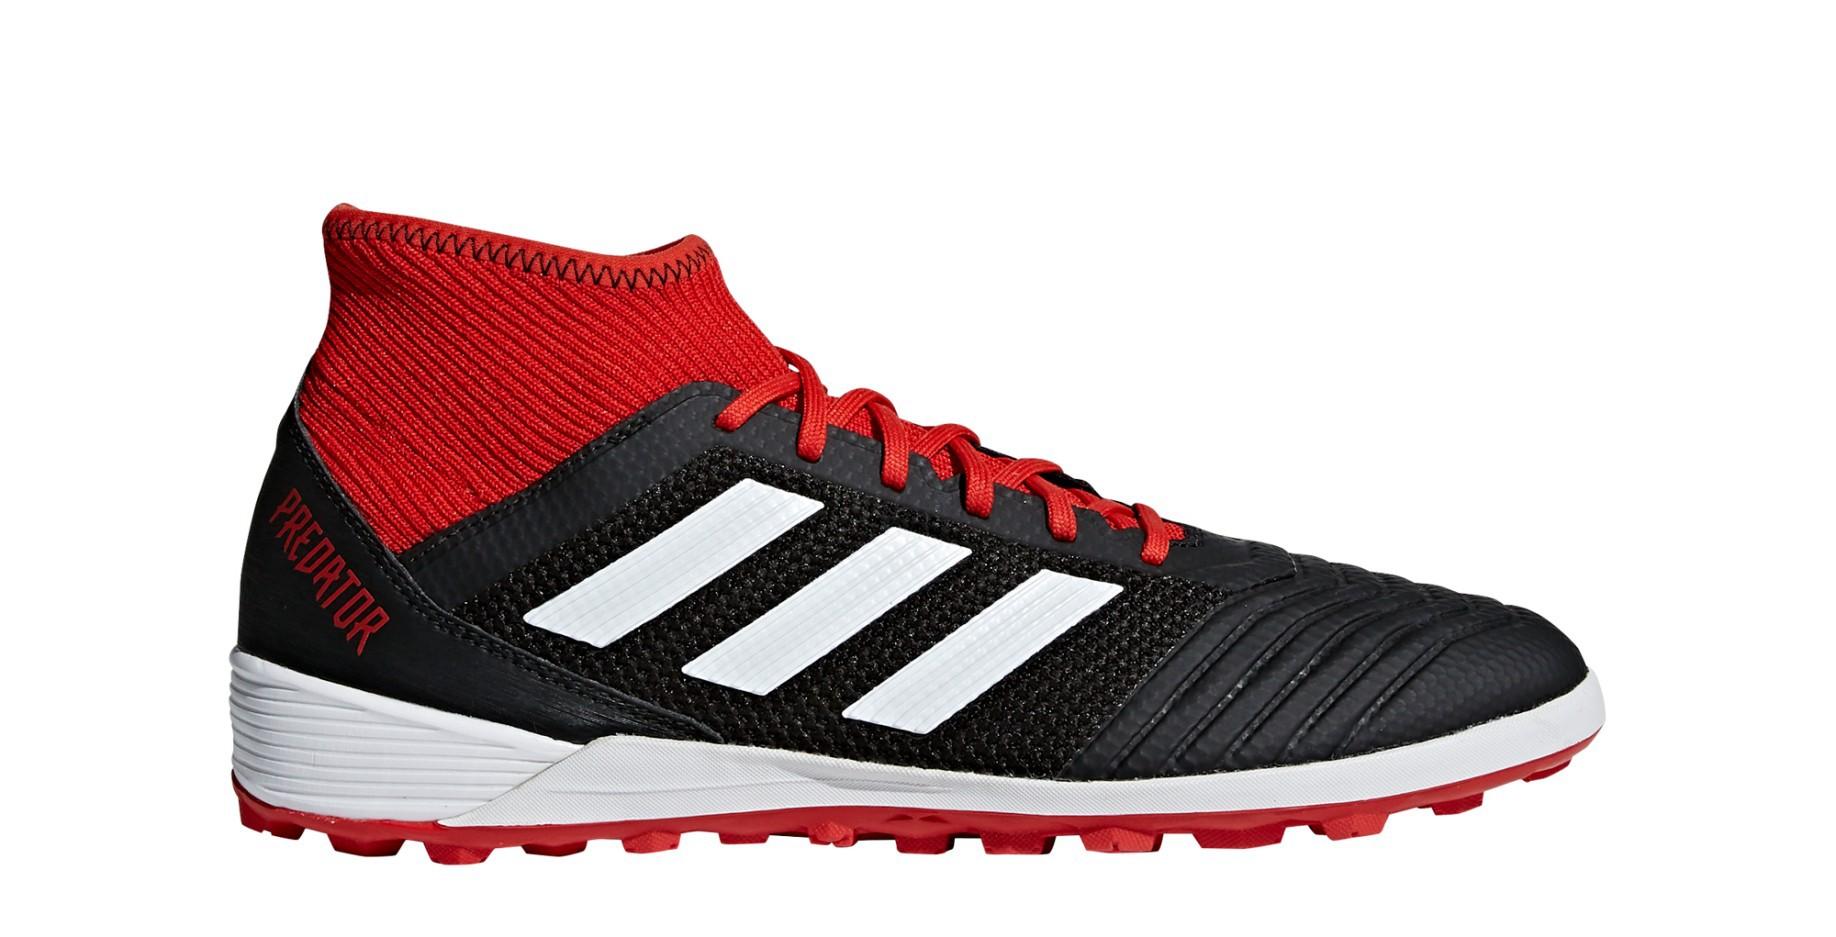 Pack Adidas Colore Tango Predator 3 Mode 18 Calcetto Team Tf Scarpe nzqvWBW